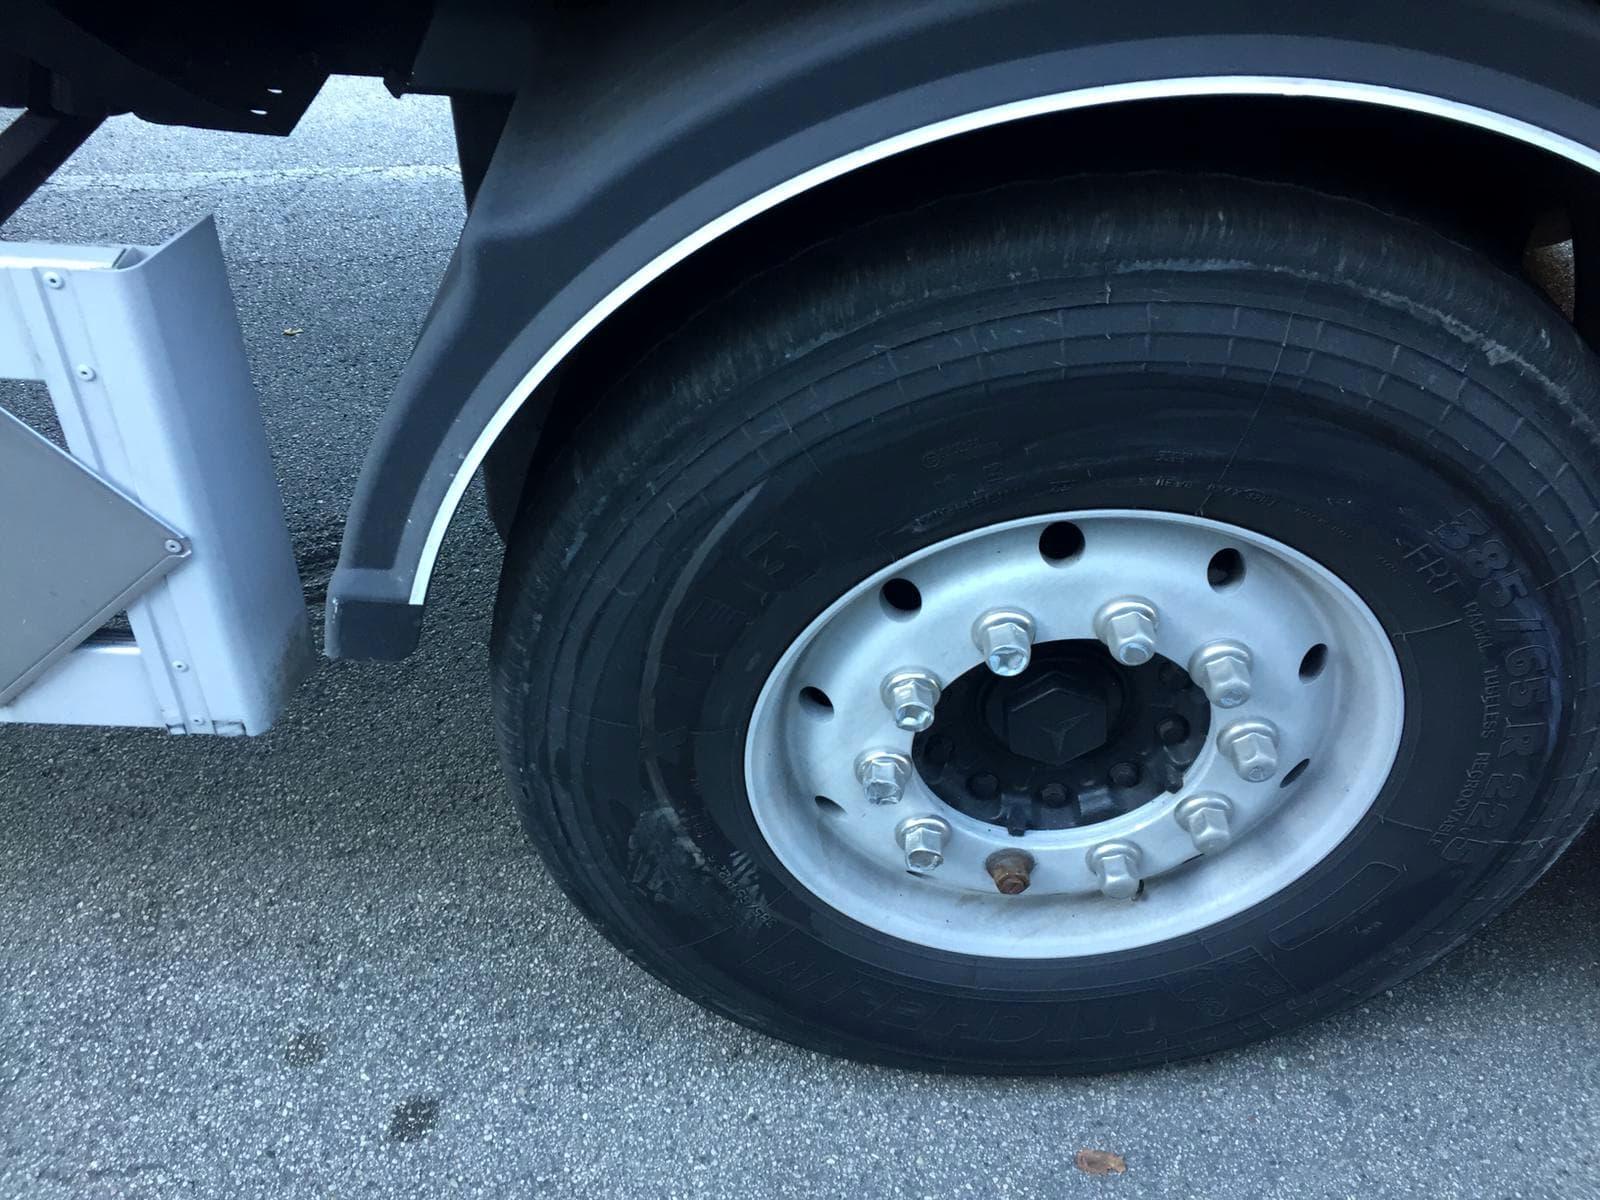 camion incidentato-2